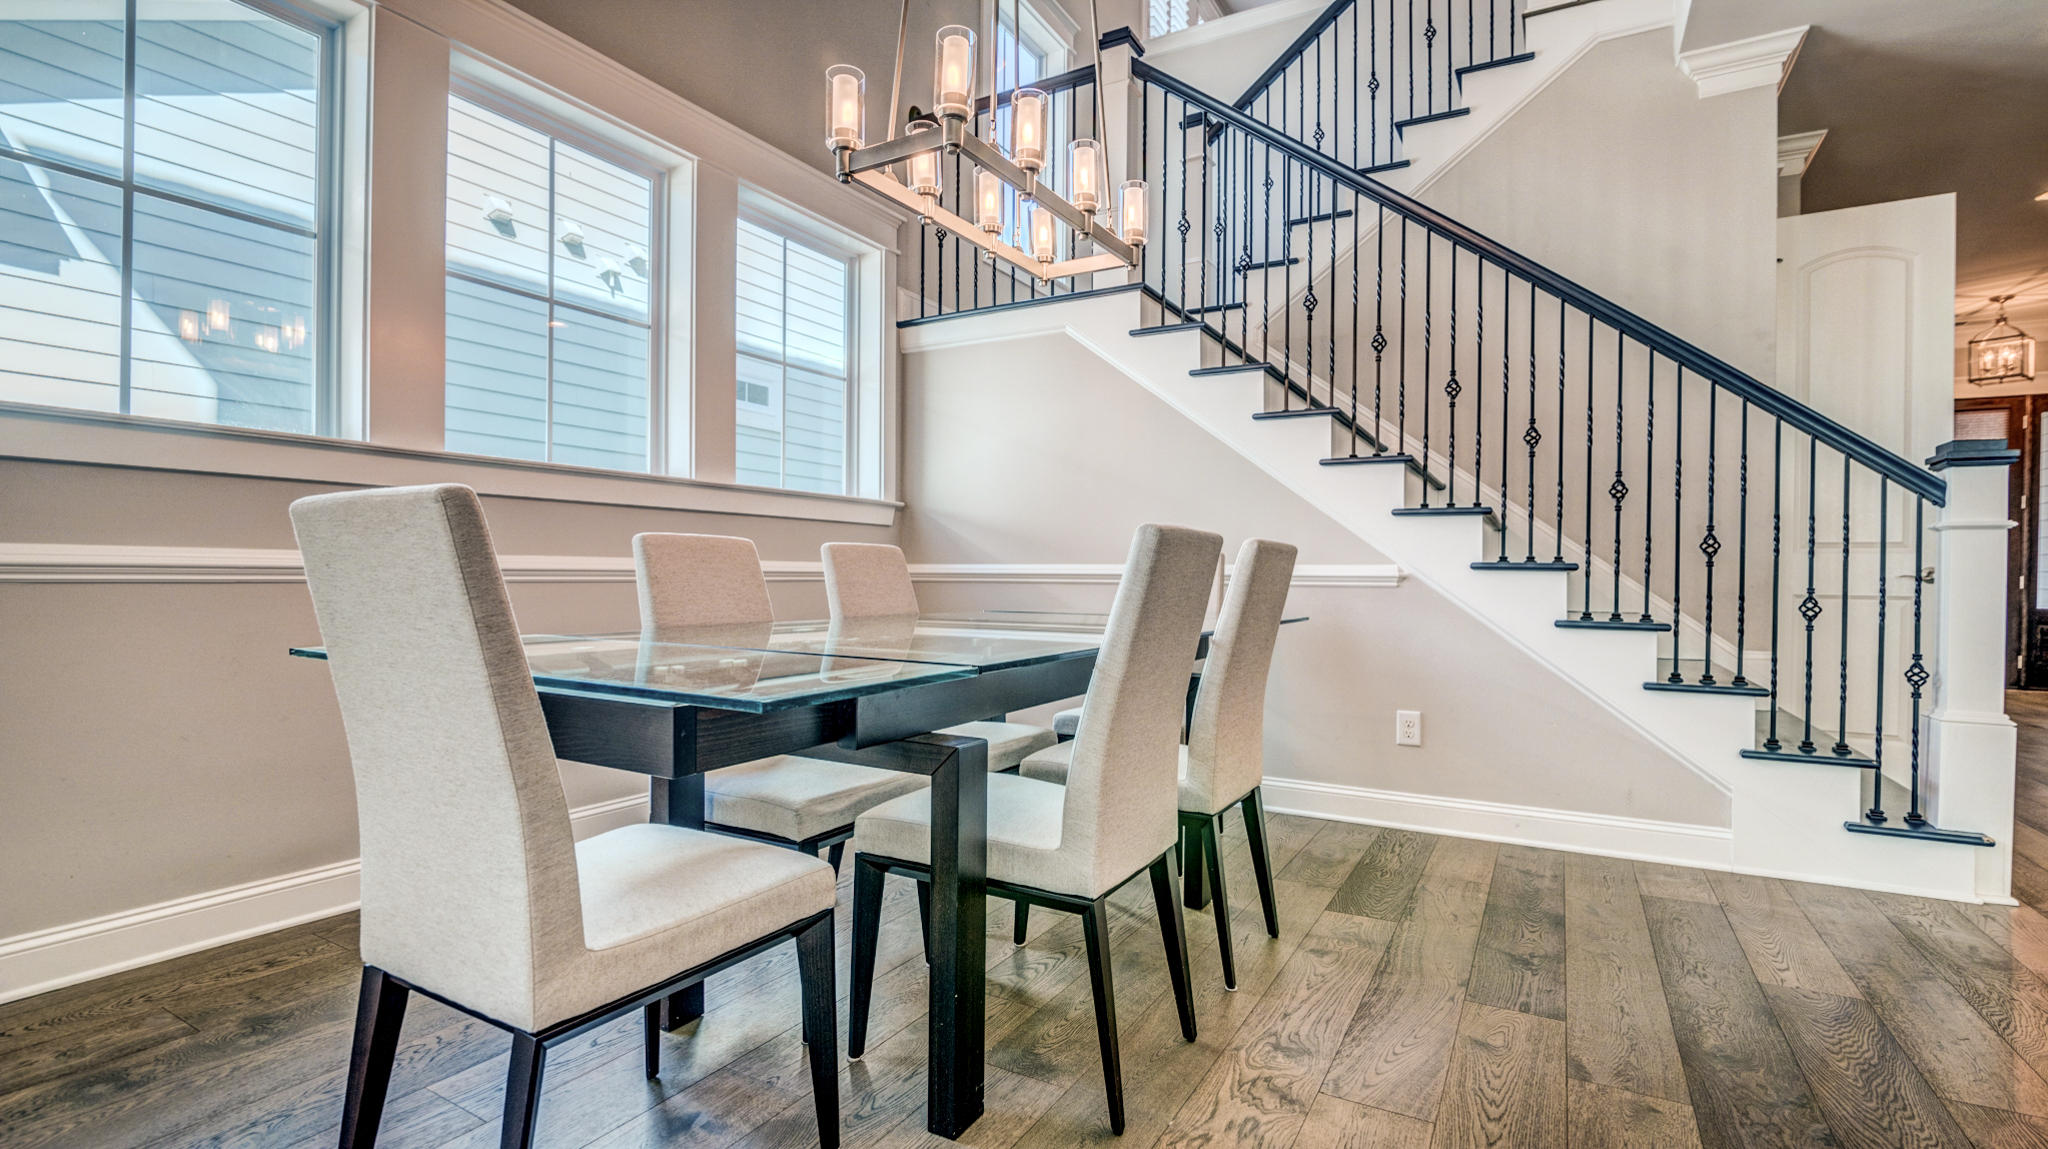 Carolina Park Homes For Sale - 3687 Spindrift, Mount Pleasant, SC - 5